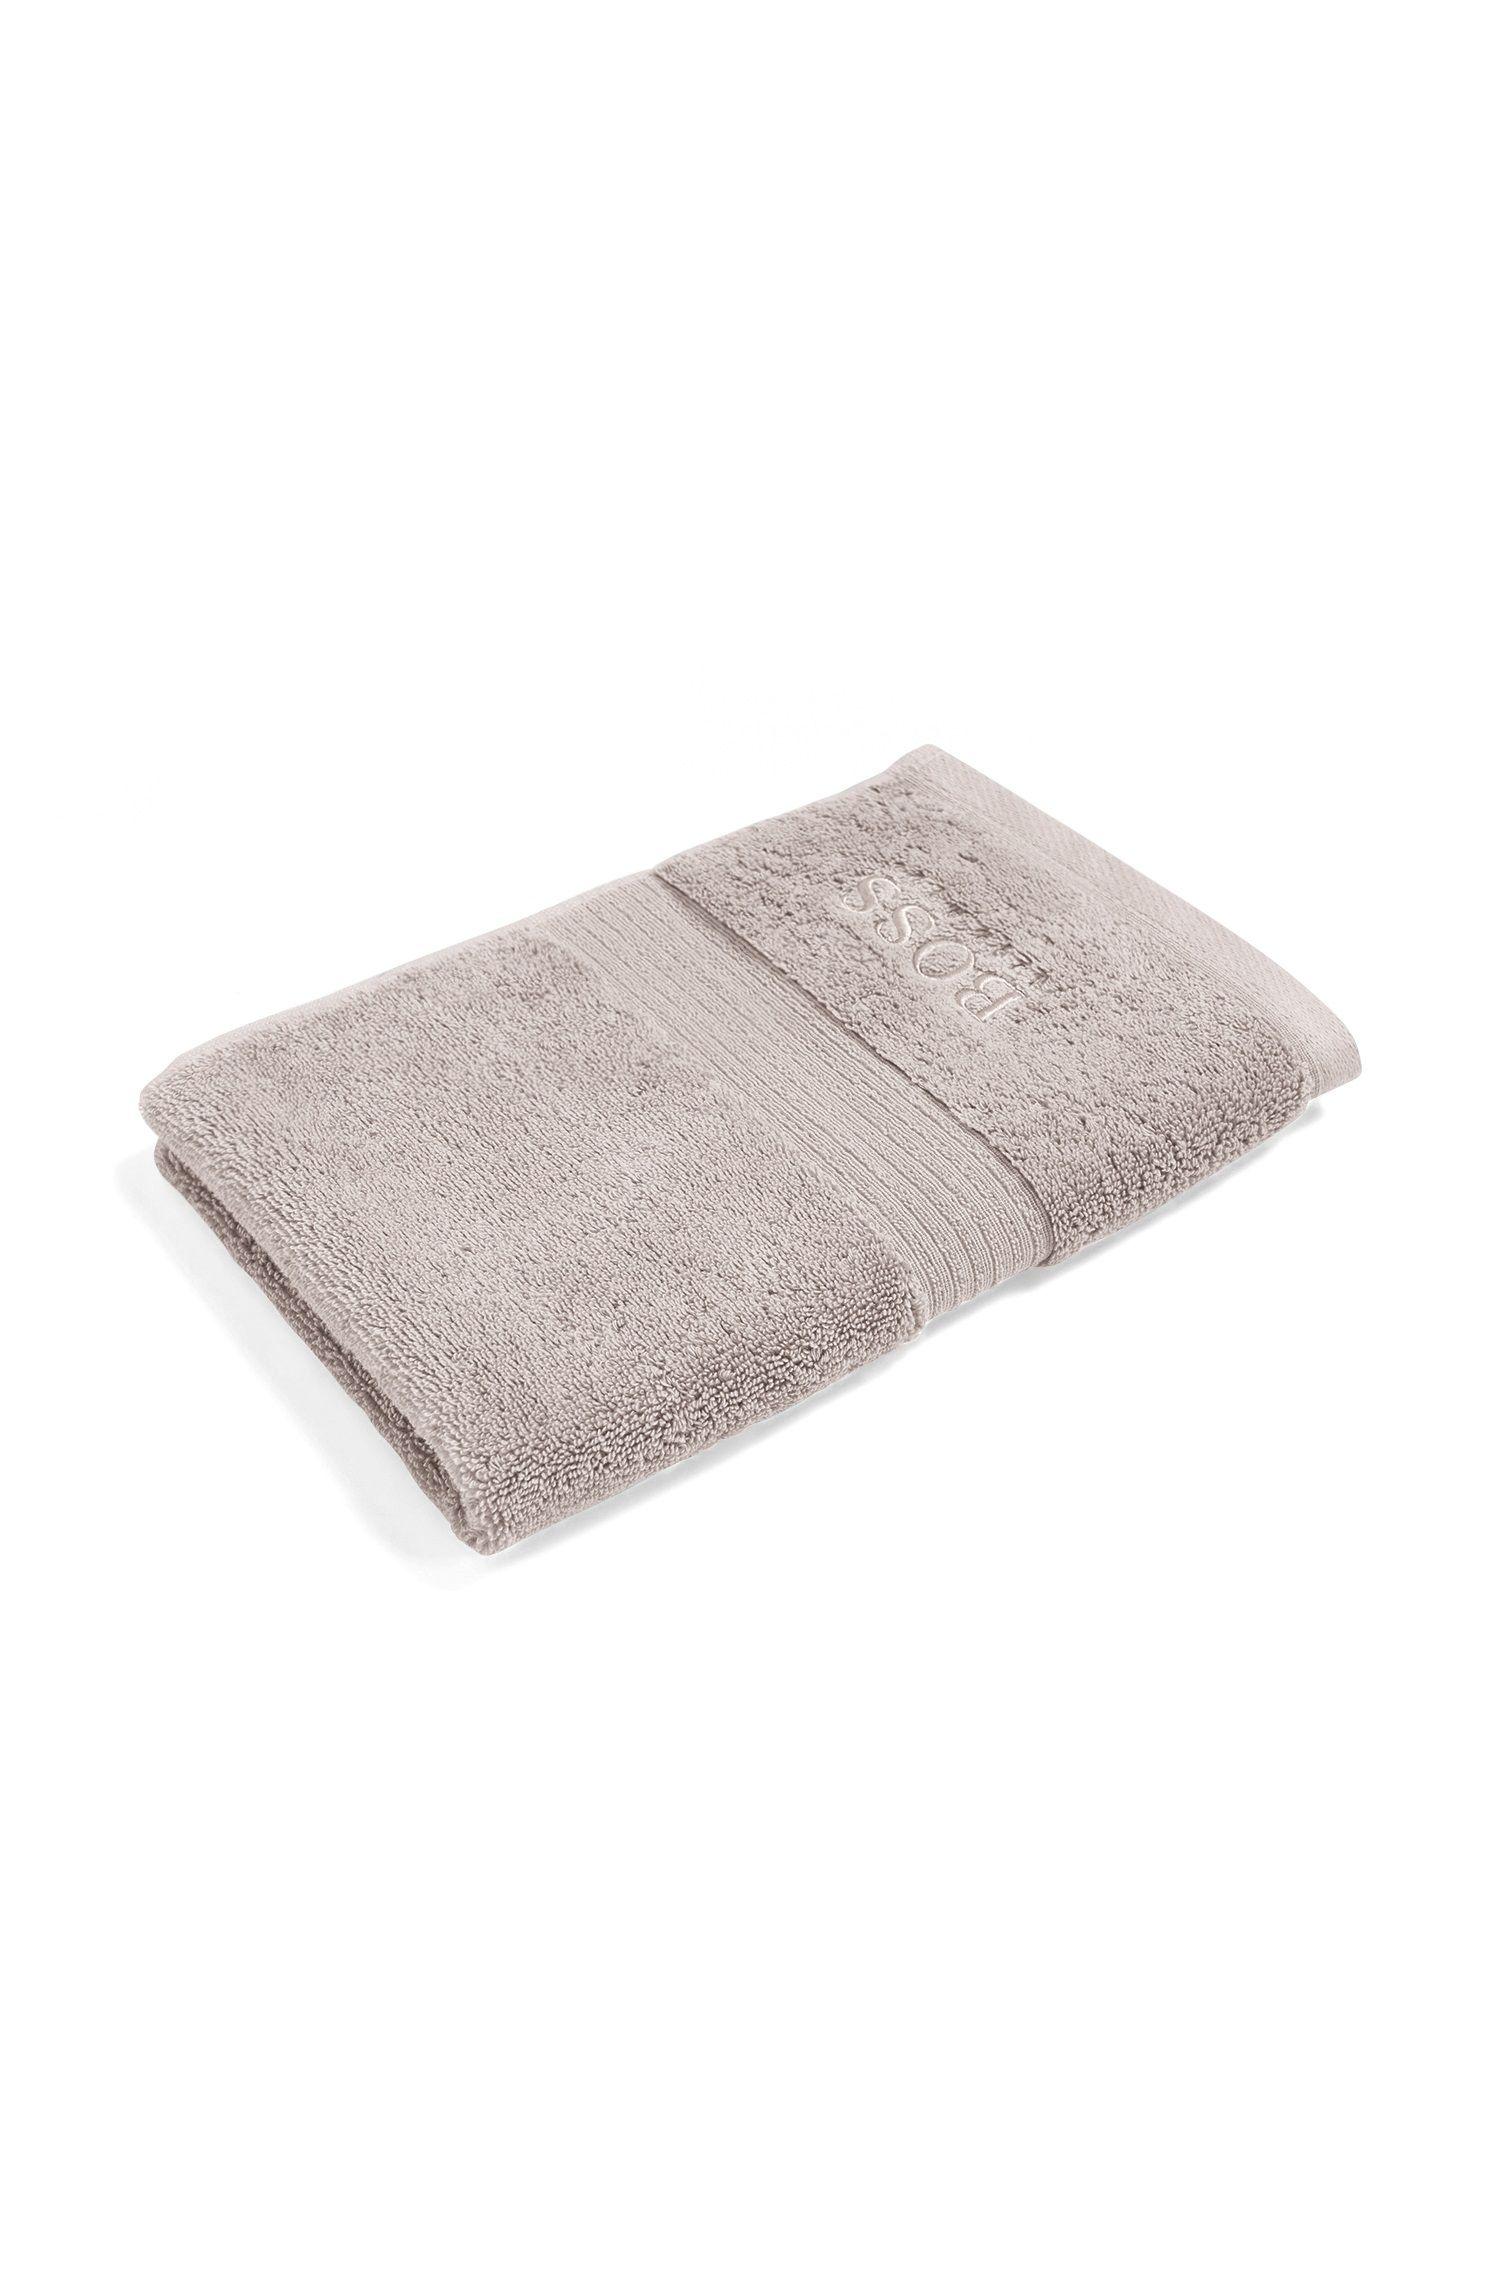 Guest towel 'LOFT Invite' in cotton terry